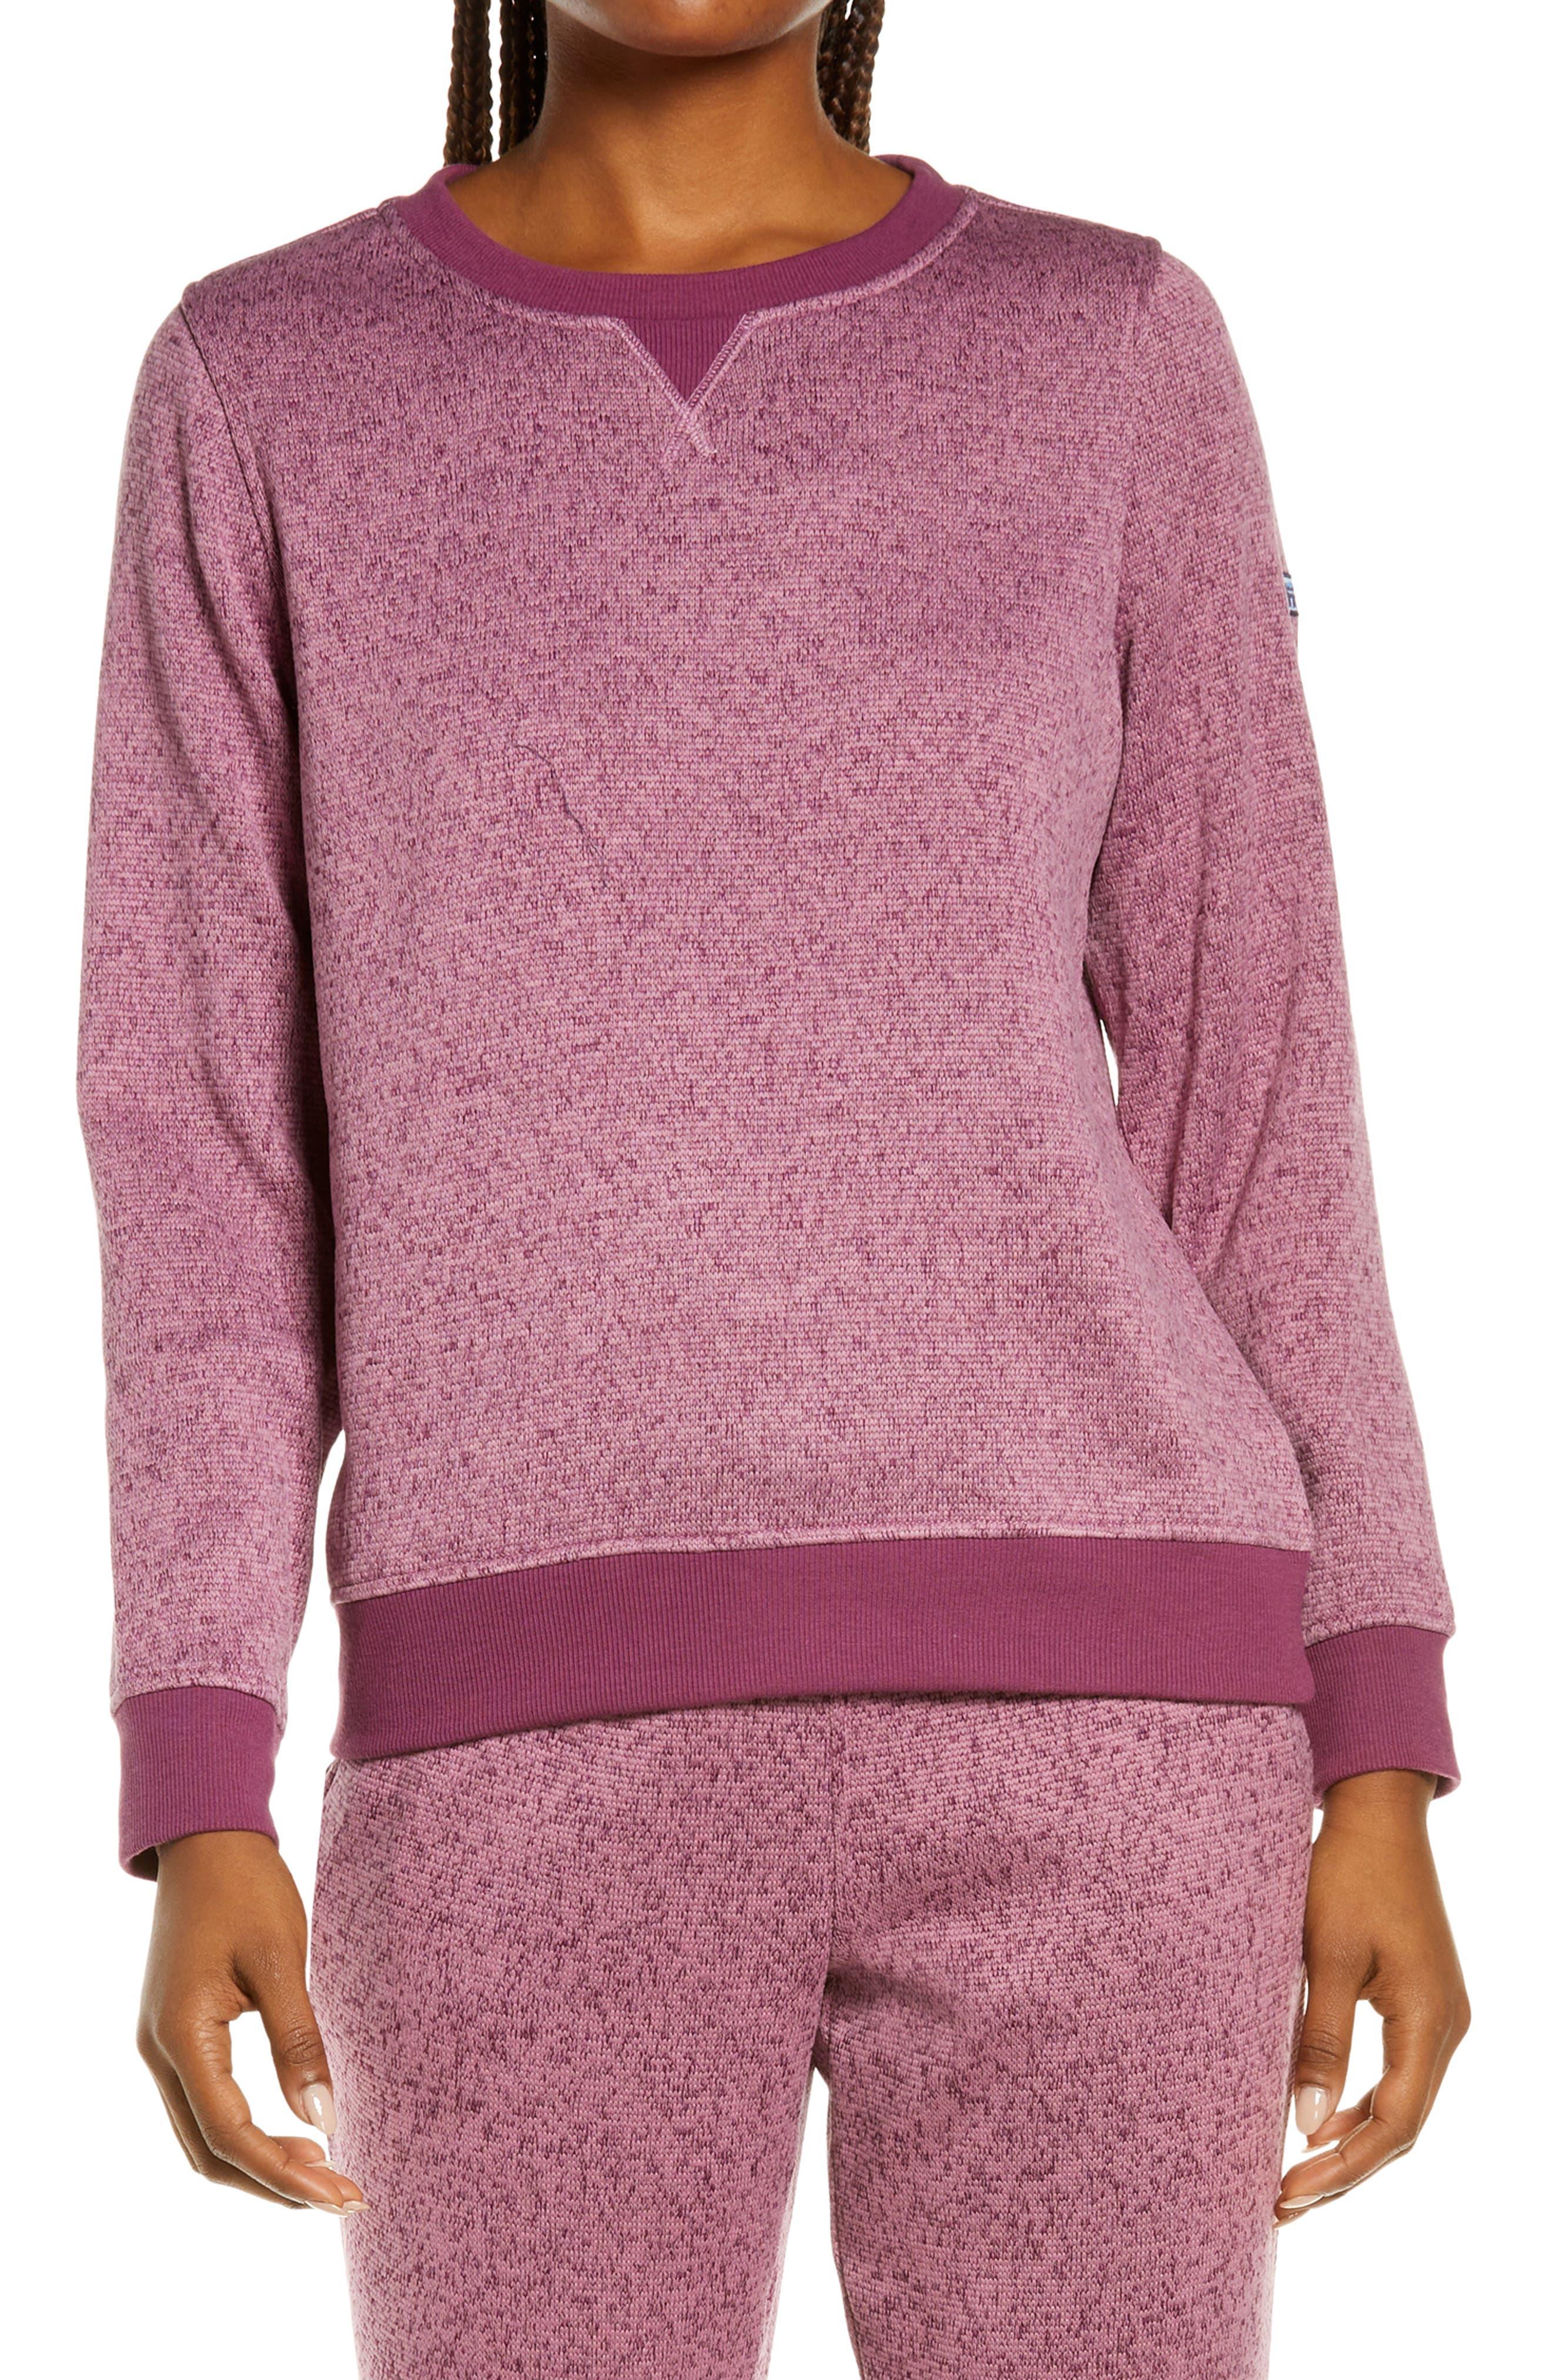 Sweater Fleece Women's Sweatshirt